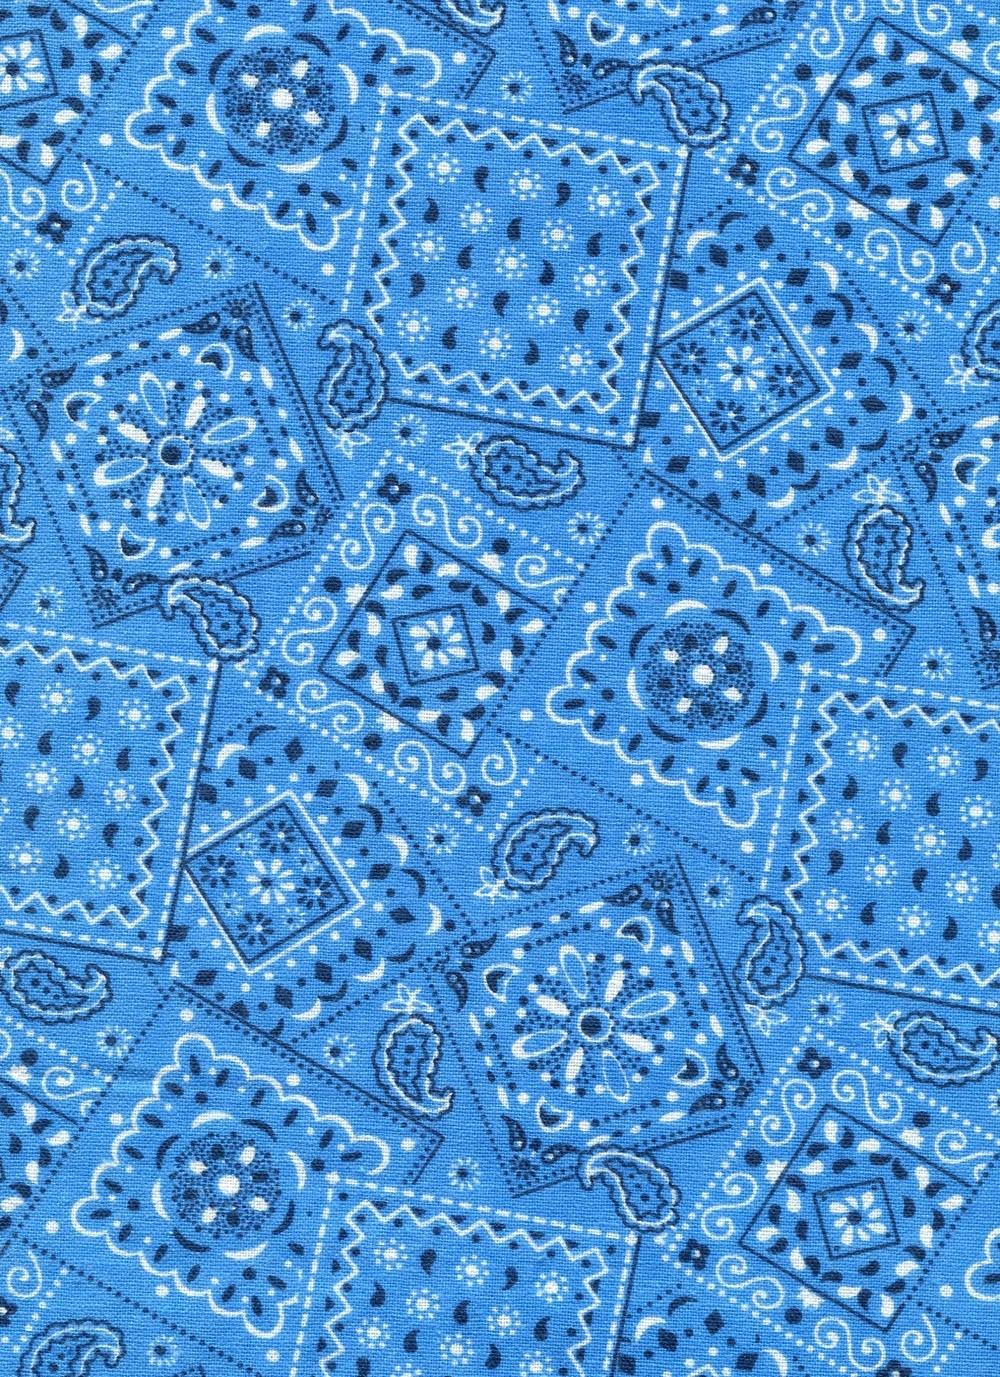 Blue Bandana Wallpaper   HD Wallpapers Lovely 1000x1377